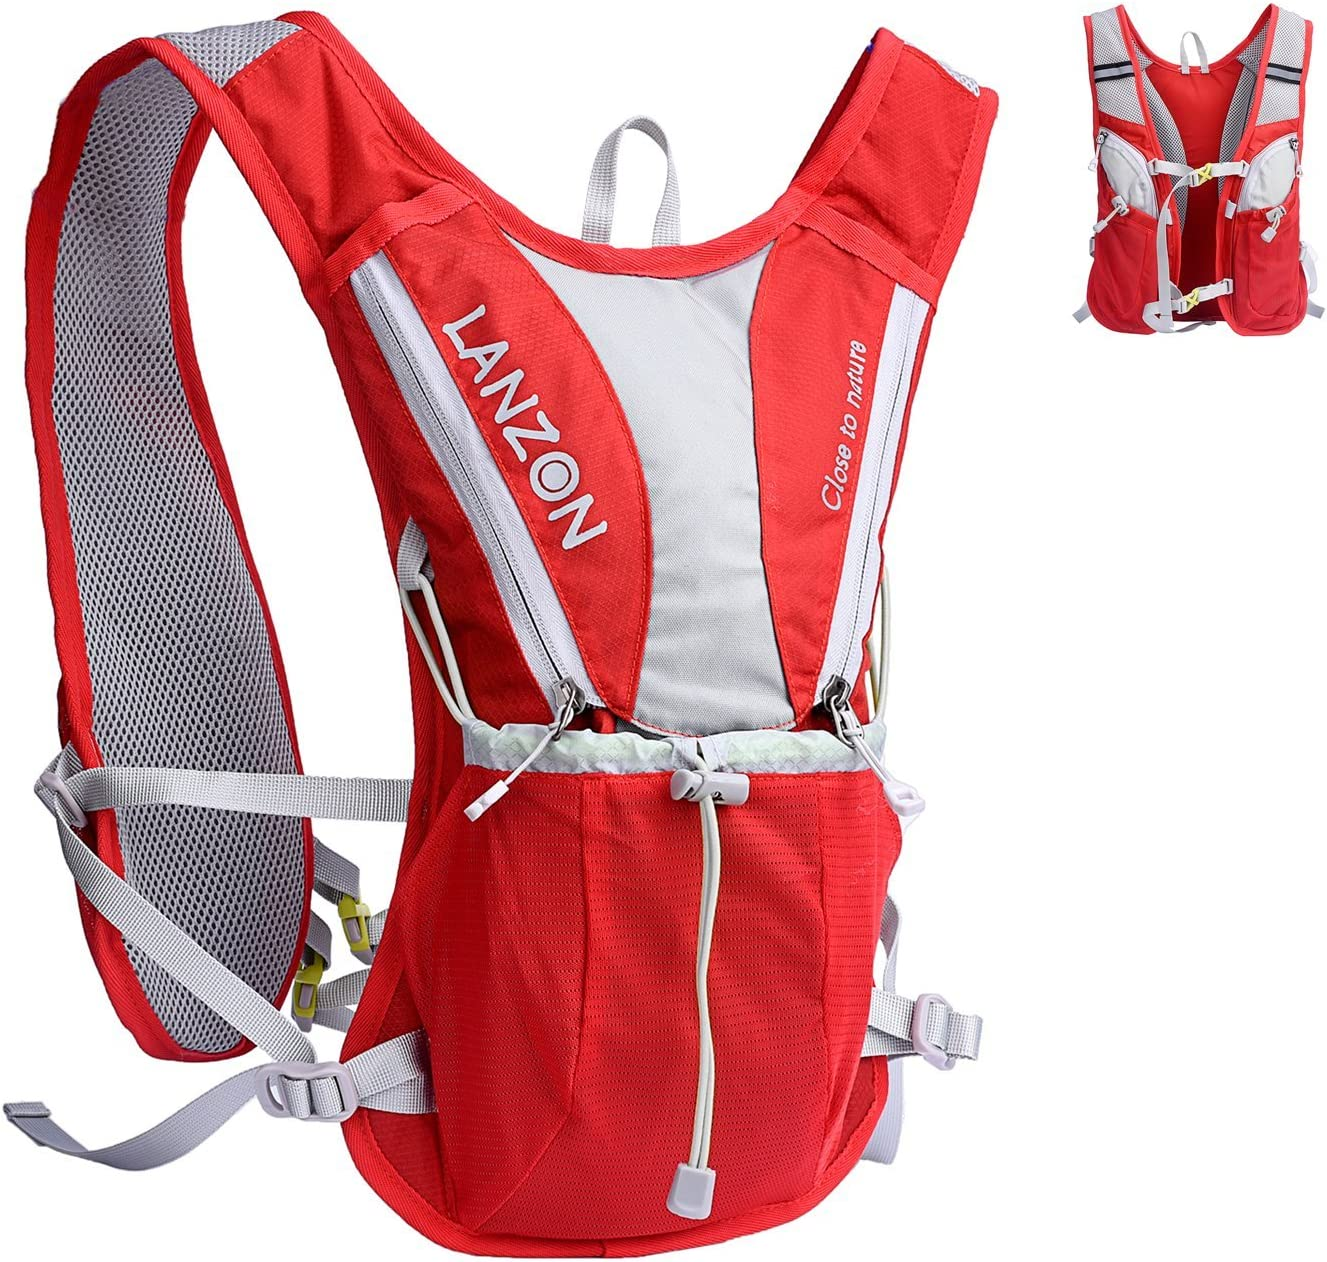 LANZON 2L Hydration Pack (NO Bladder), Marathon Running Vest, Hiking Cycling Backpack